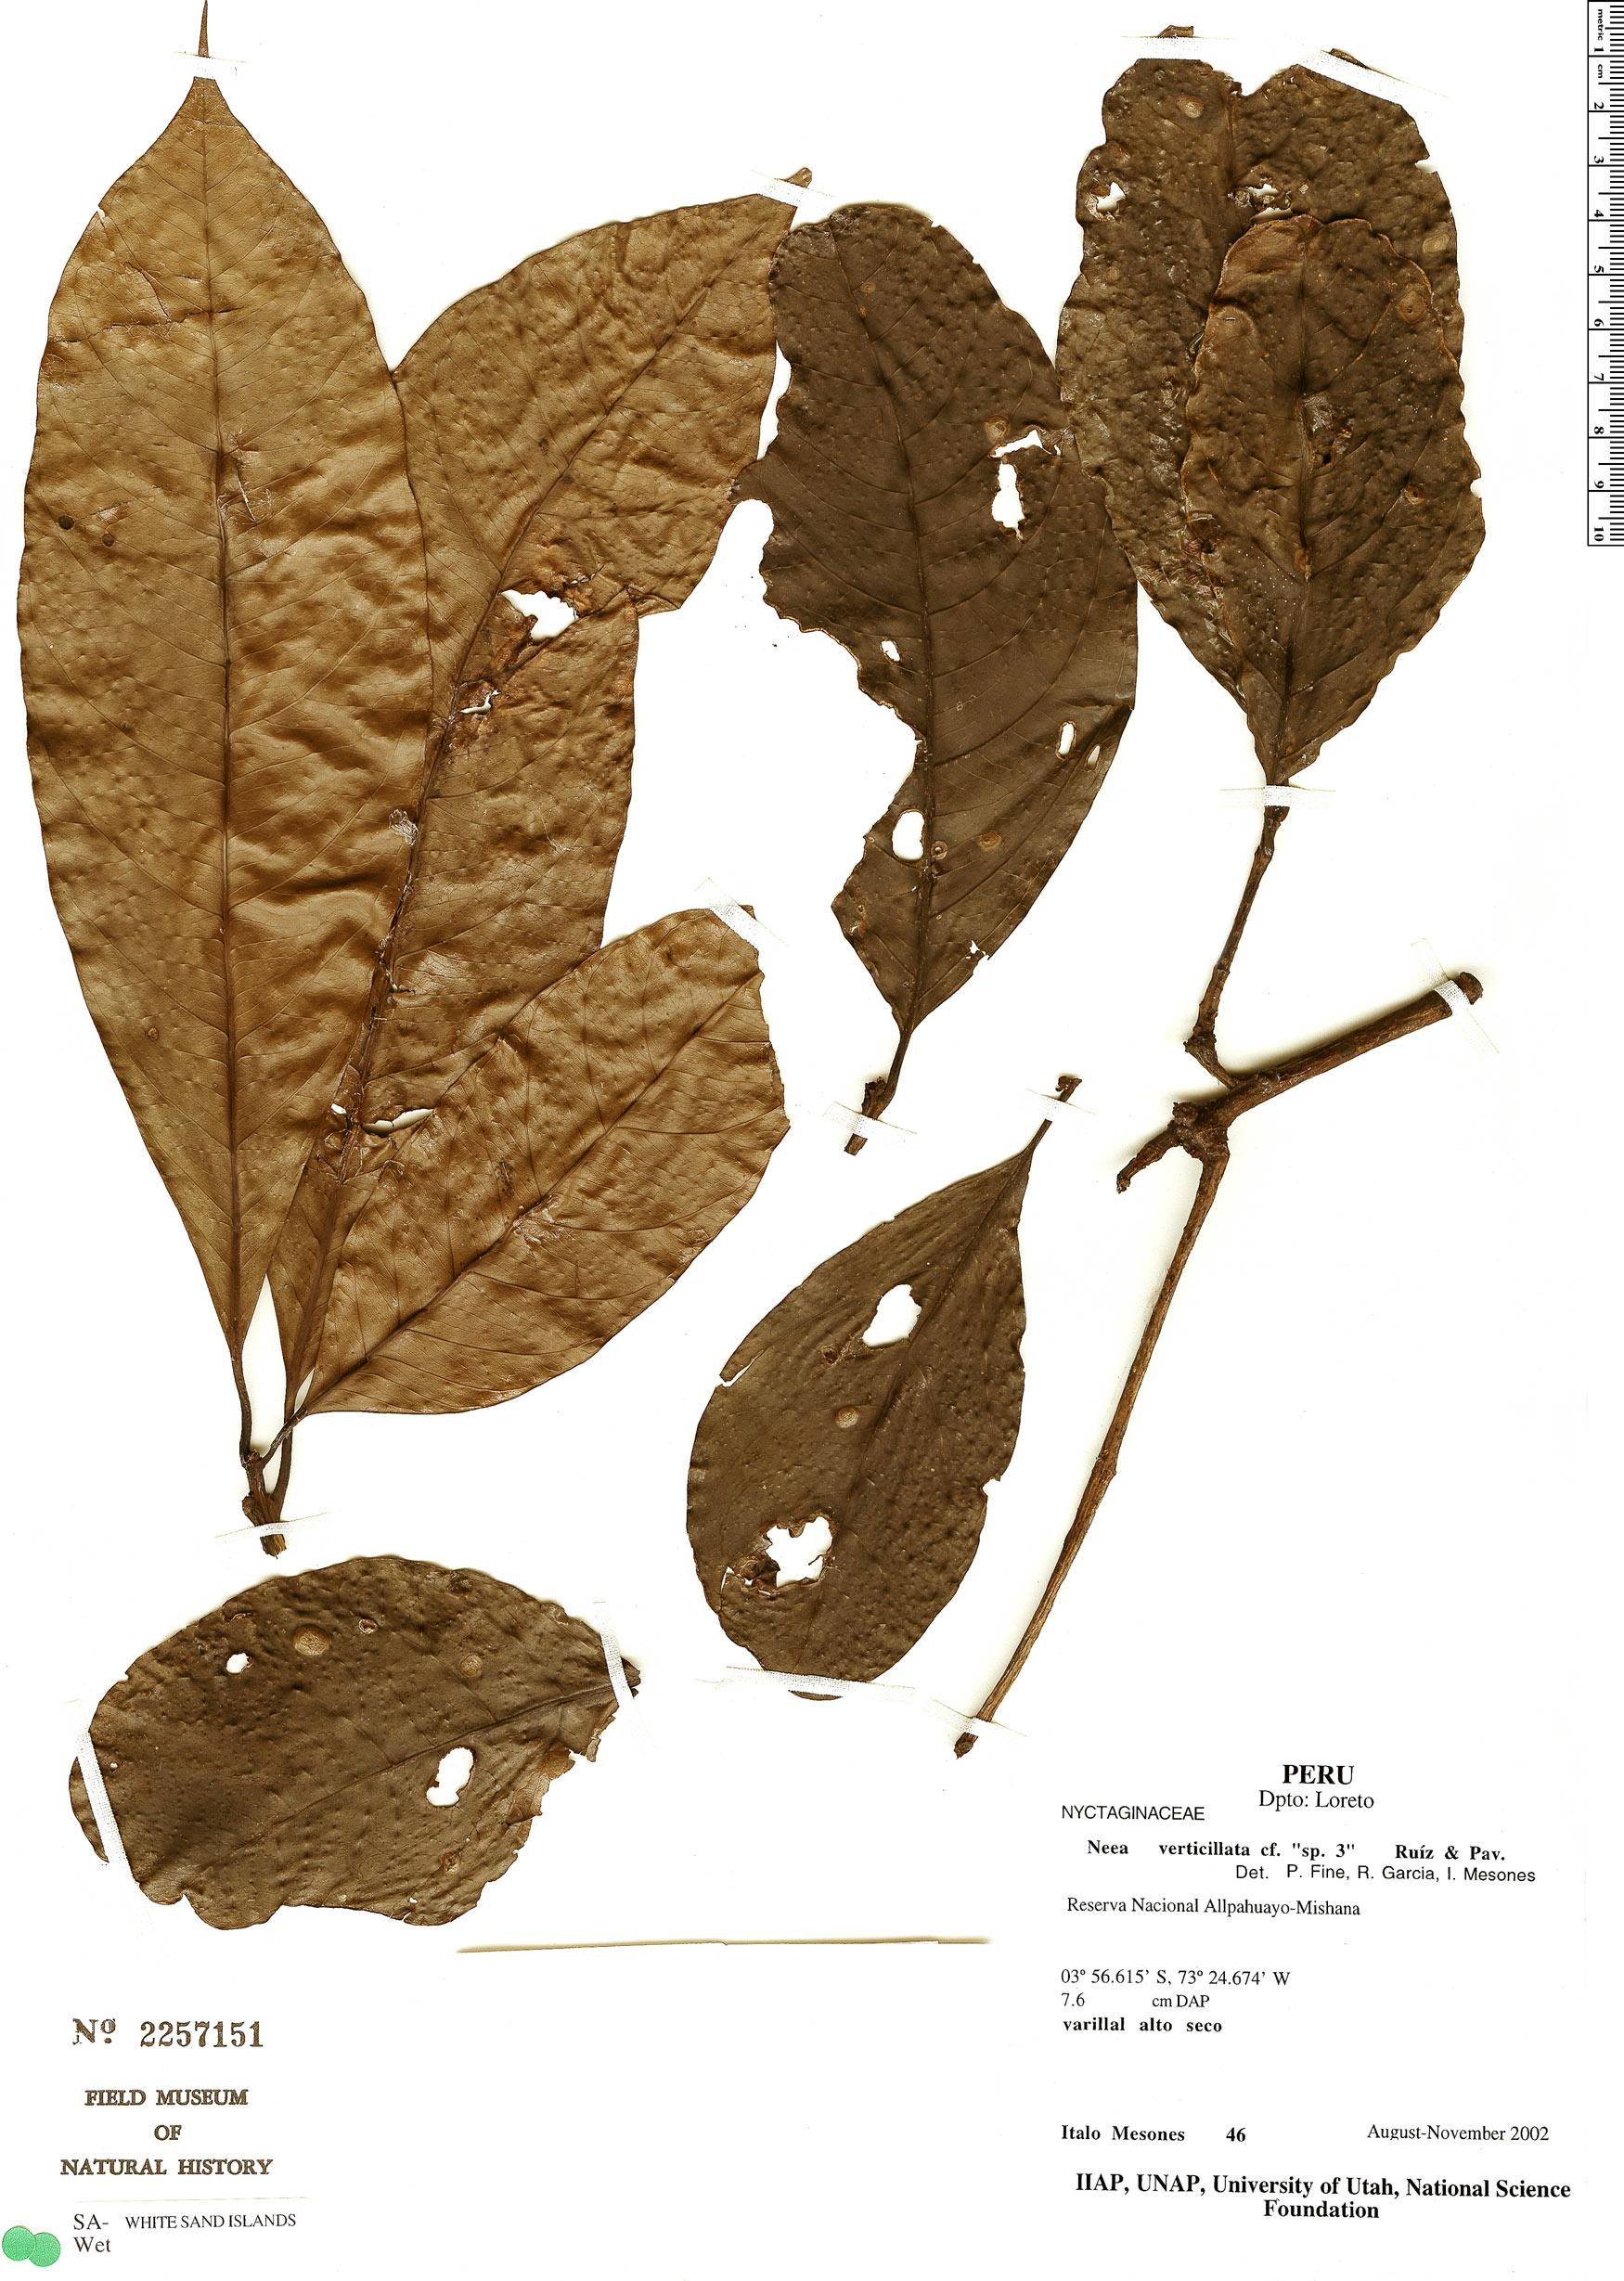 Specimen: Neea verticillata